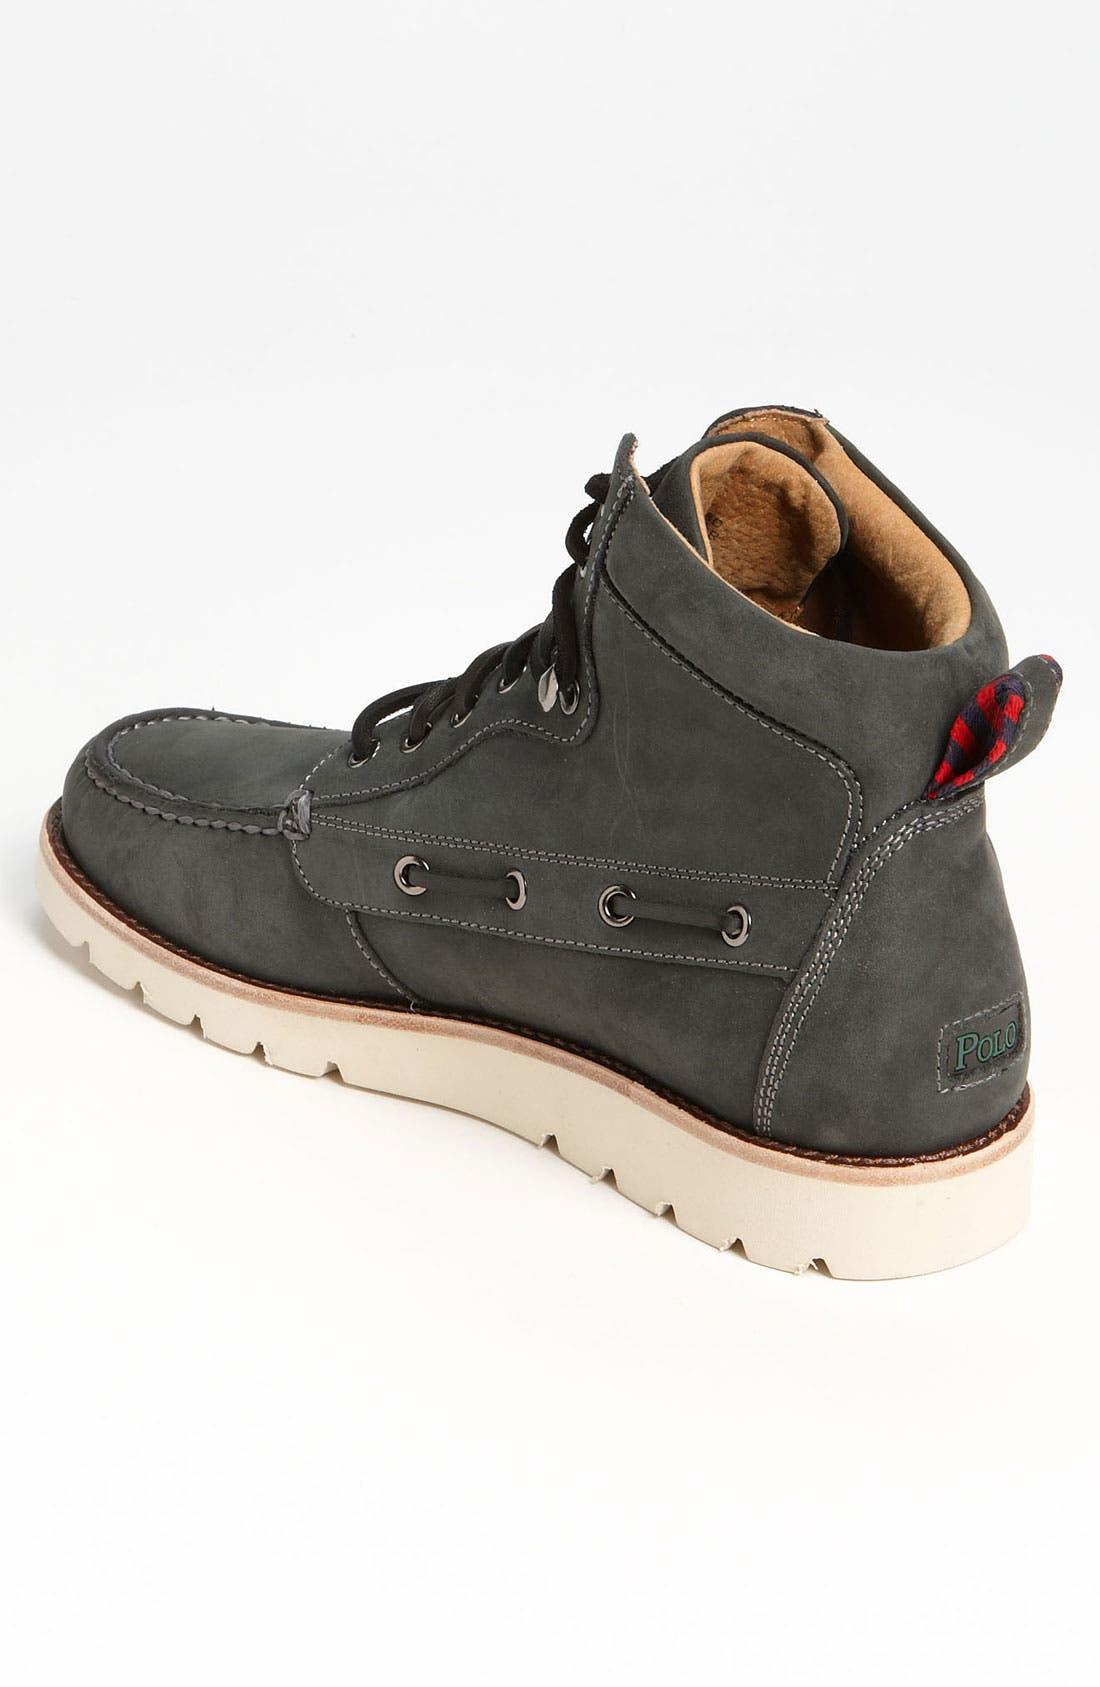 Alternate Image 2  - Polo Ralph Lauren 'Salisbury' Moc Toe Boot